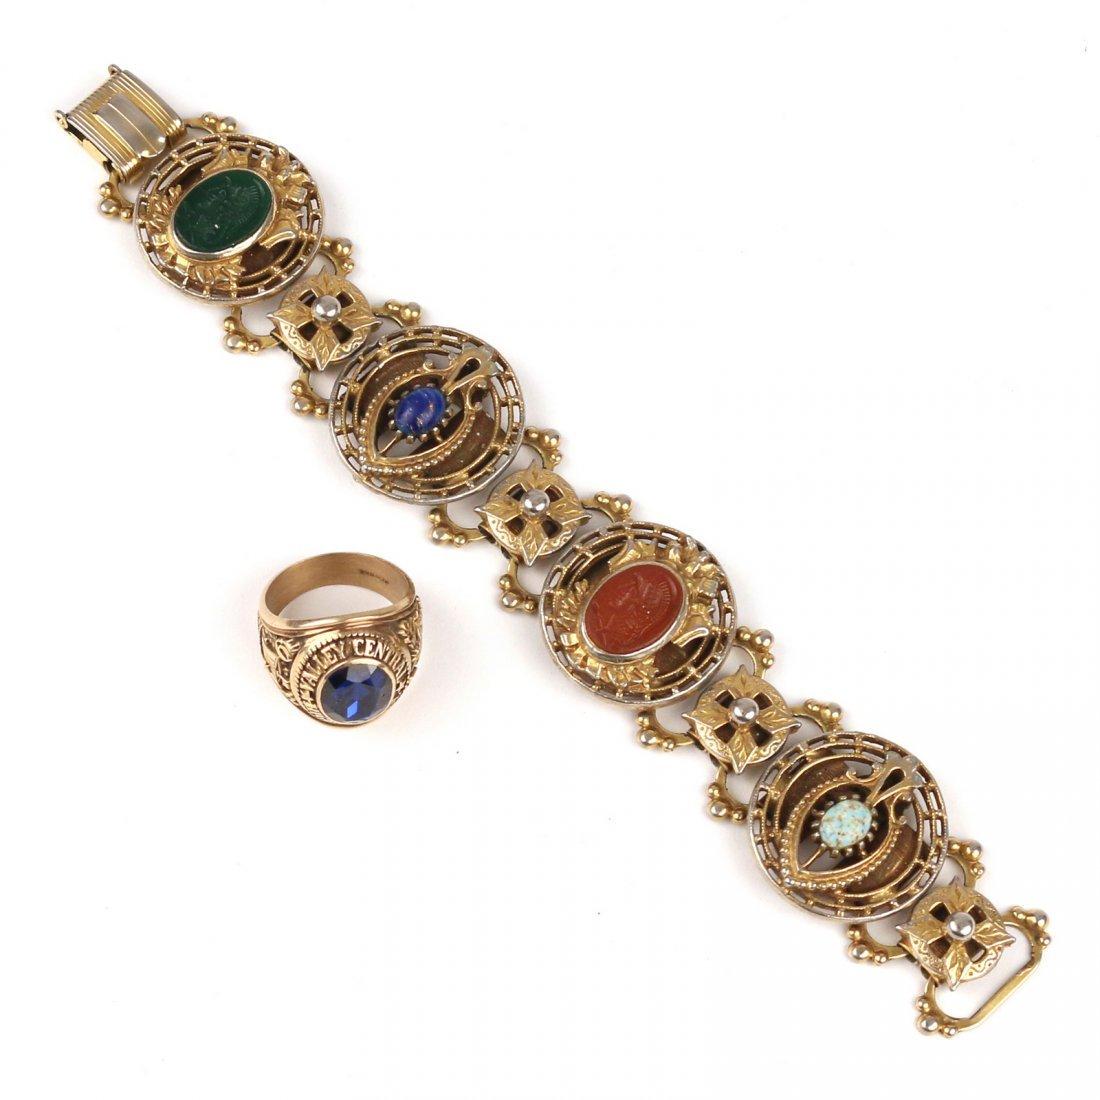 (2pc) SCOTTISH LINK BRACELET & RING